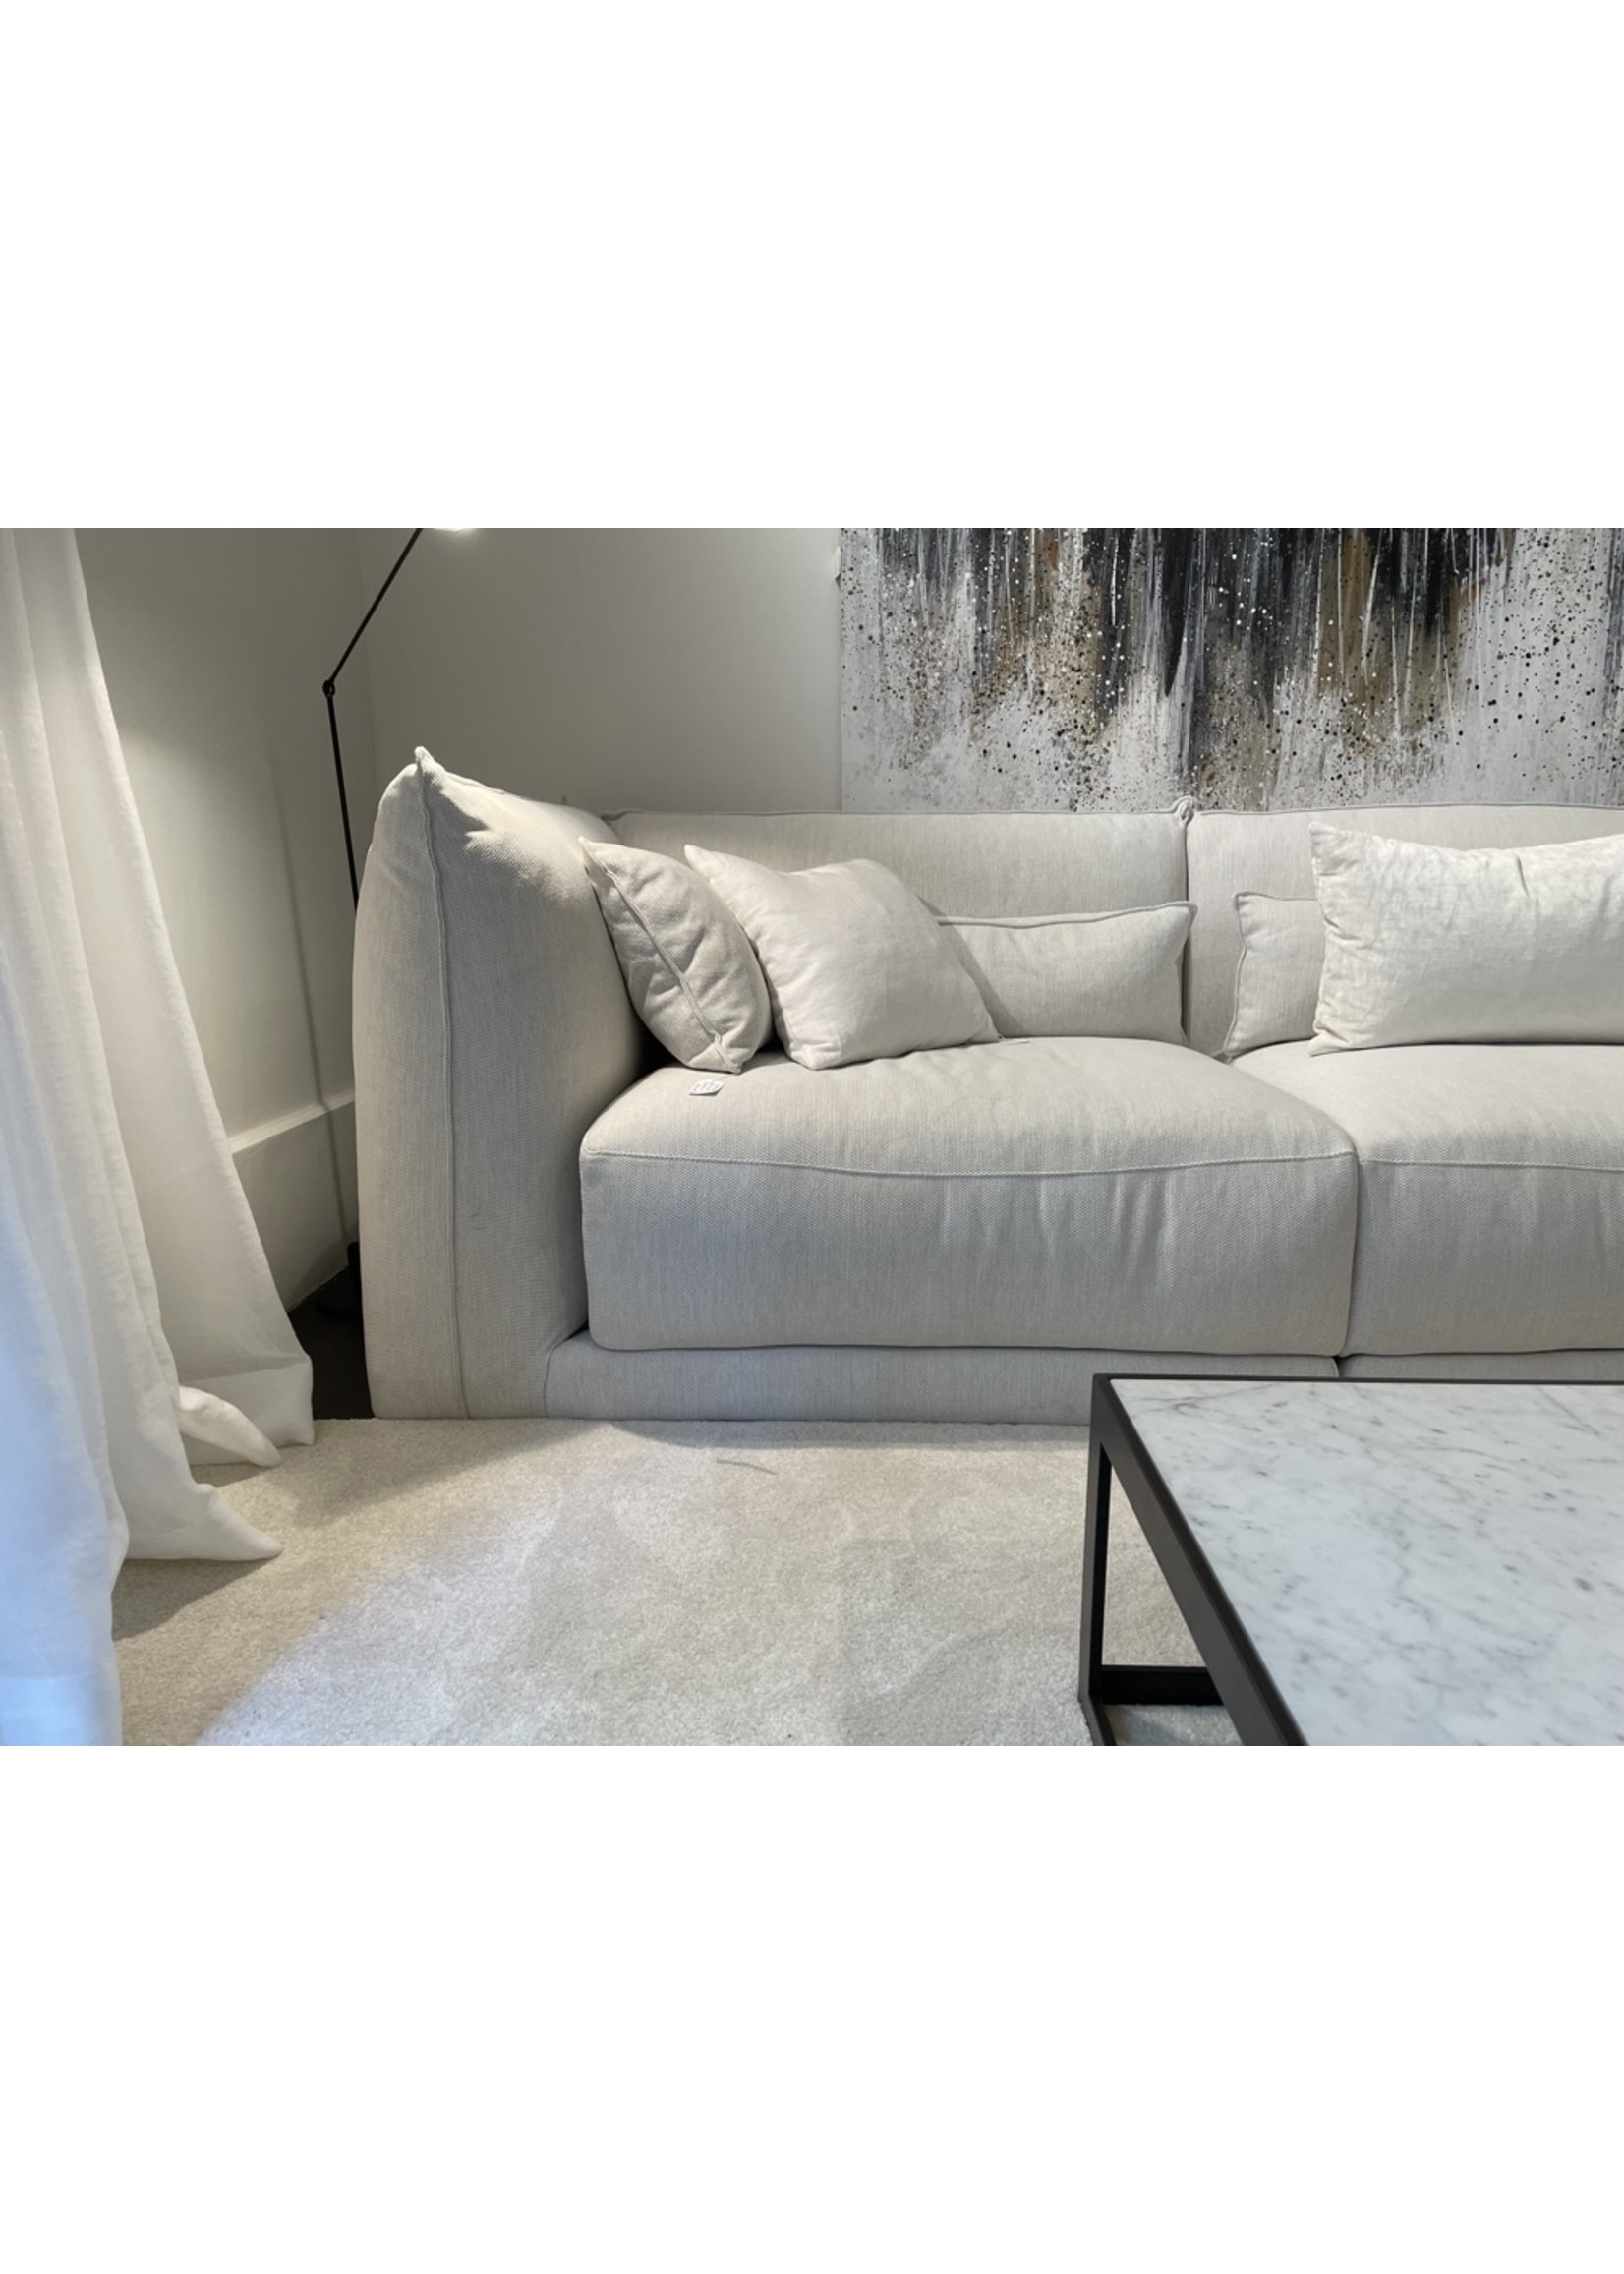 XVL COLLECTION Xvl sofa Corner Tulum 130 x 110